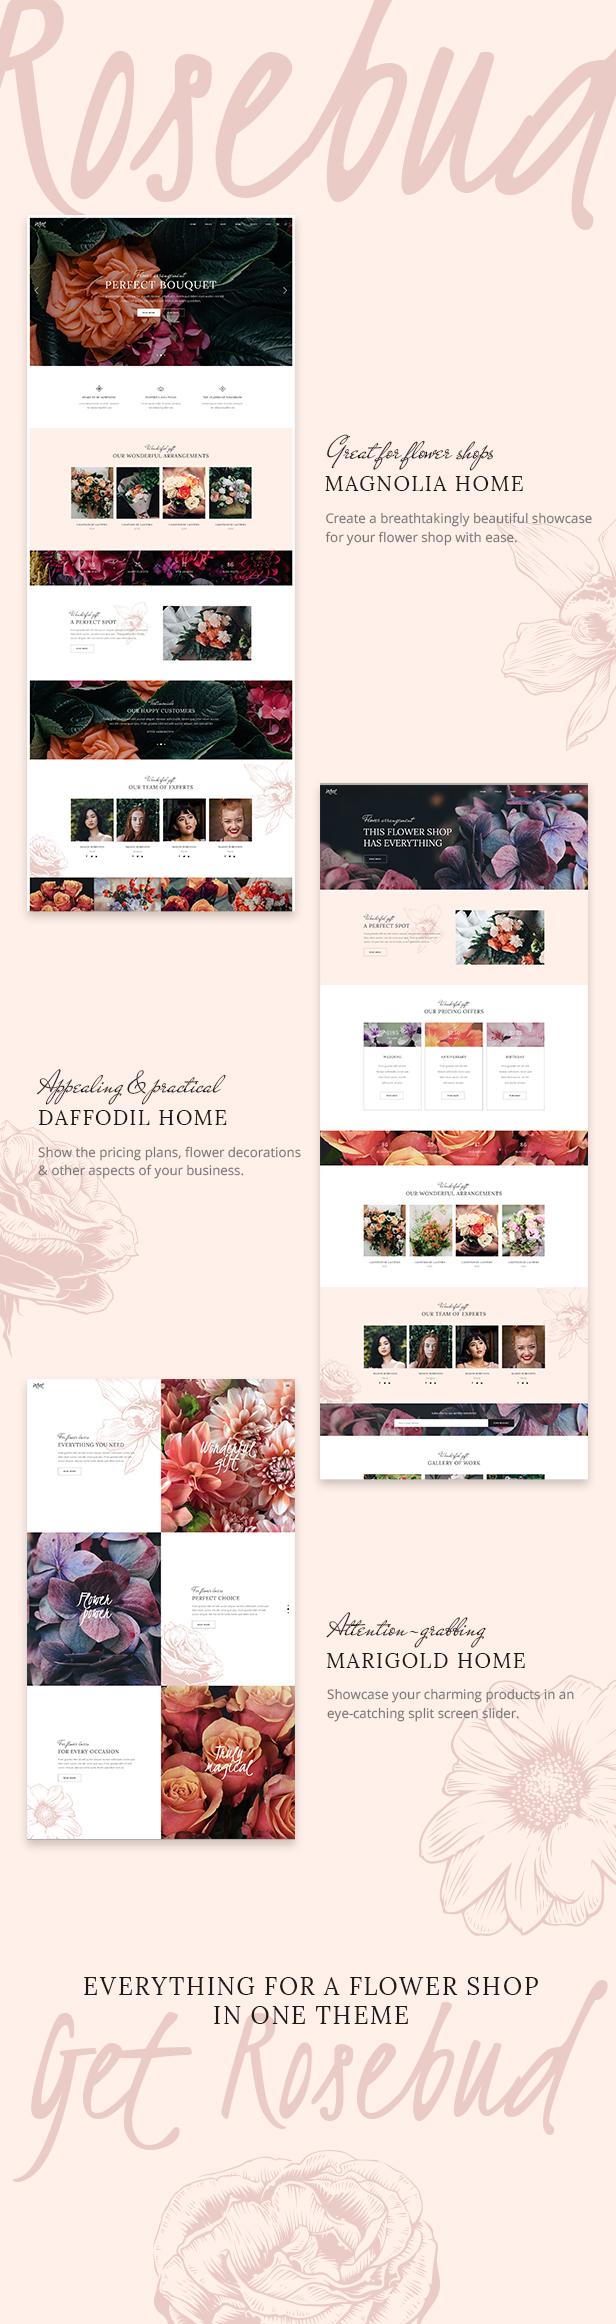 WordPress theme Rosebud - A Flower Shop and Florist WordPress Theme (Retail)